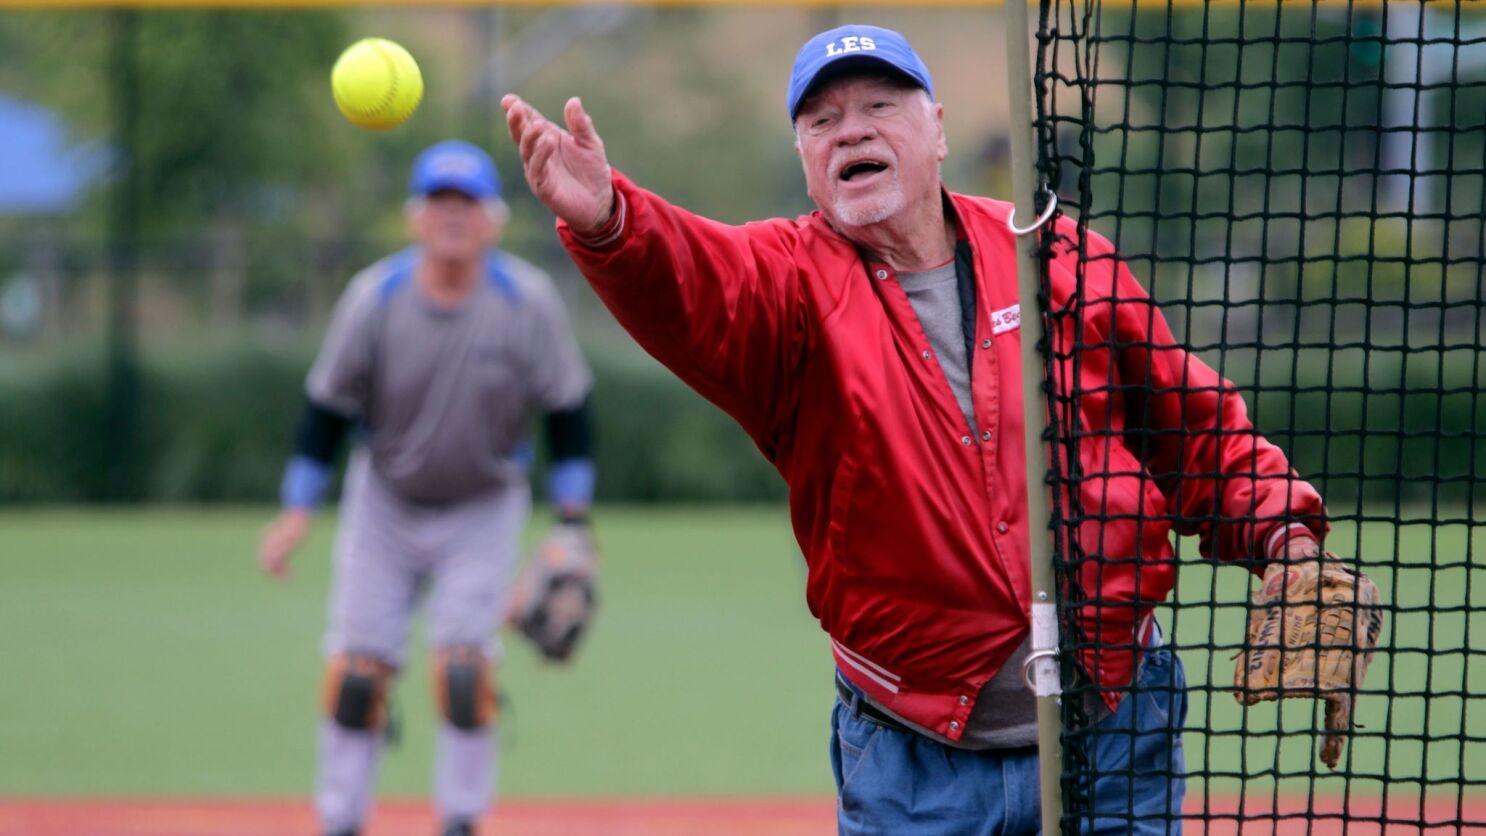 18a1367014f178 Softball league a home run with seniors - The San Diego Union-Tribune